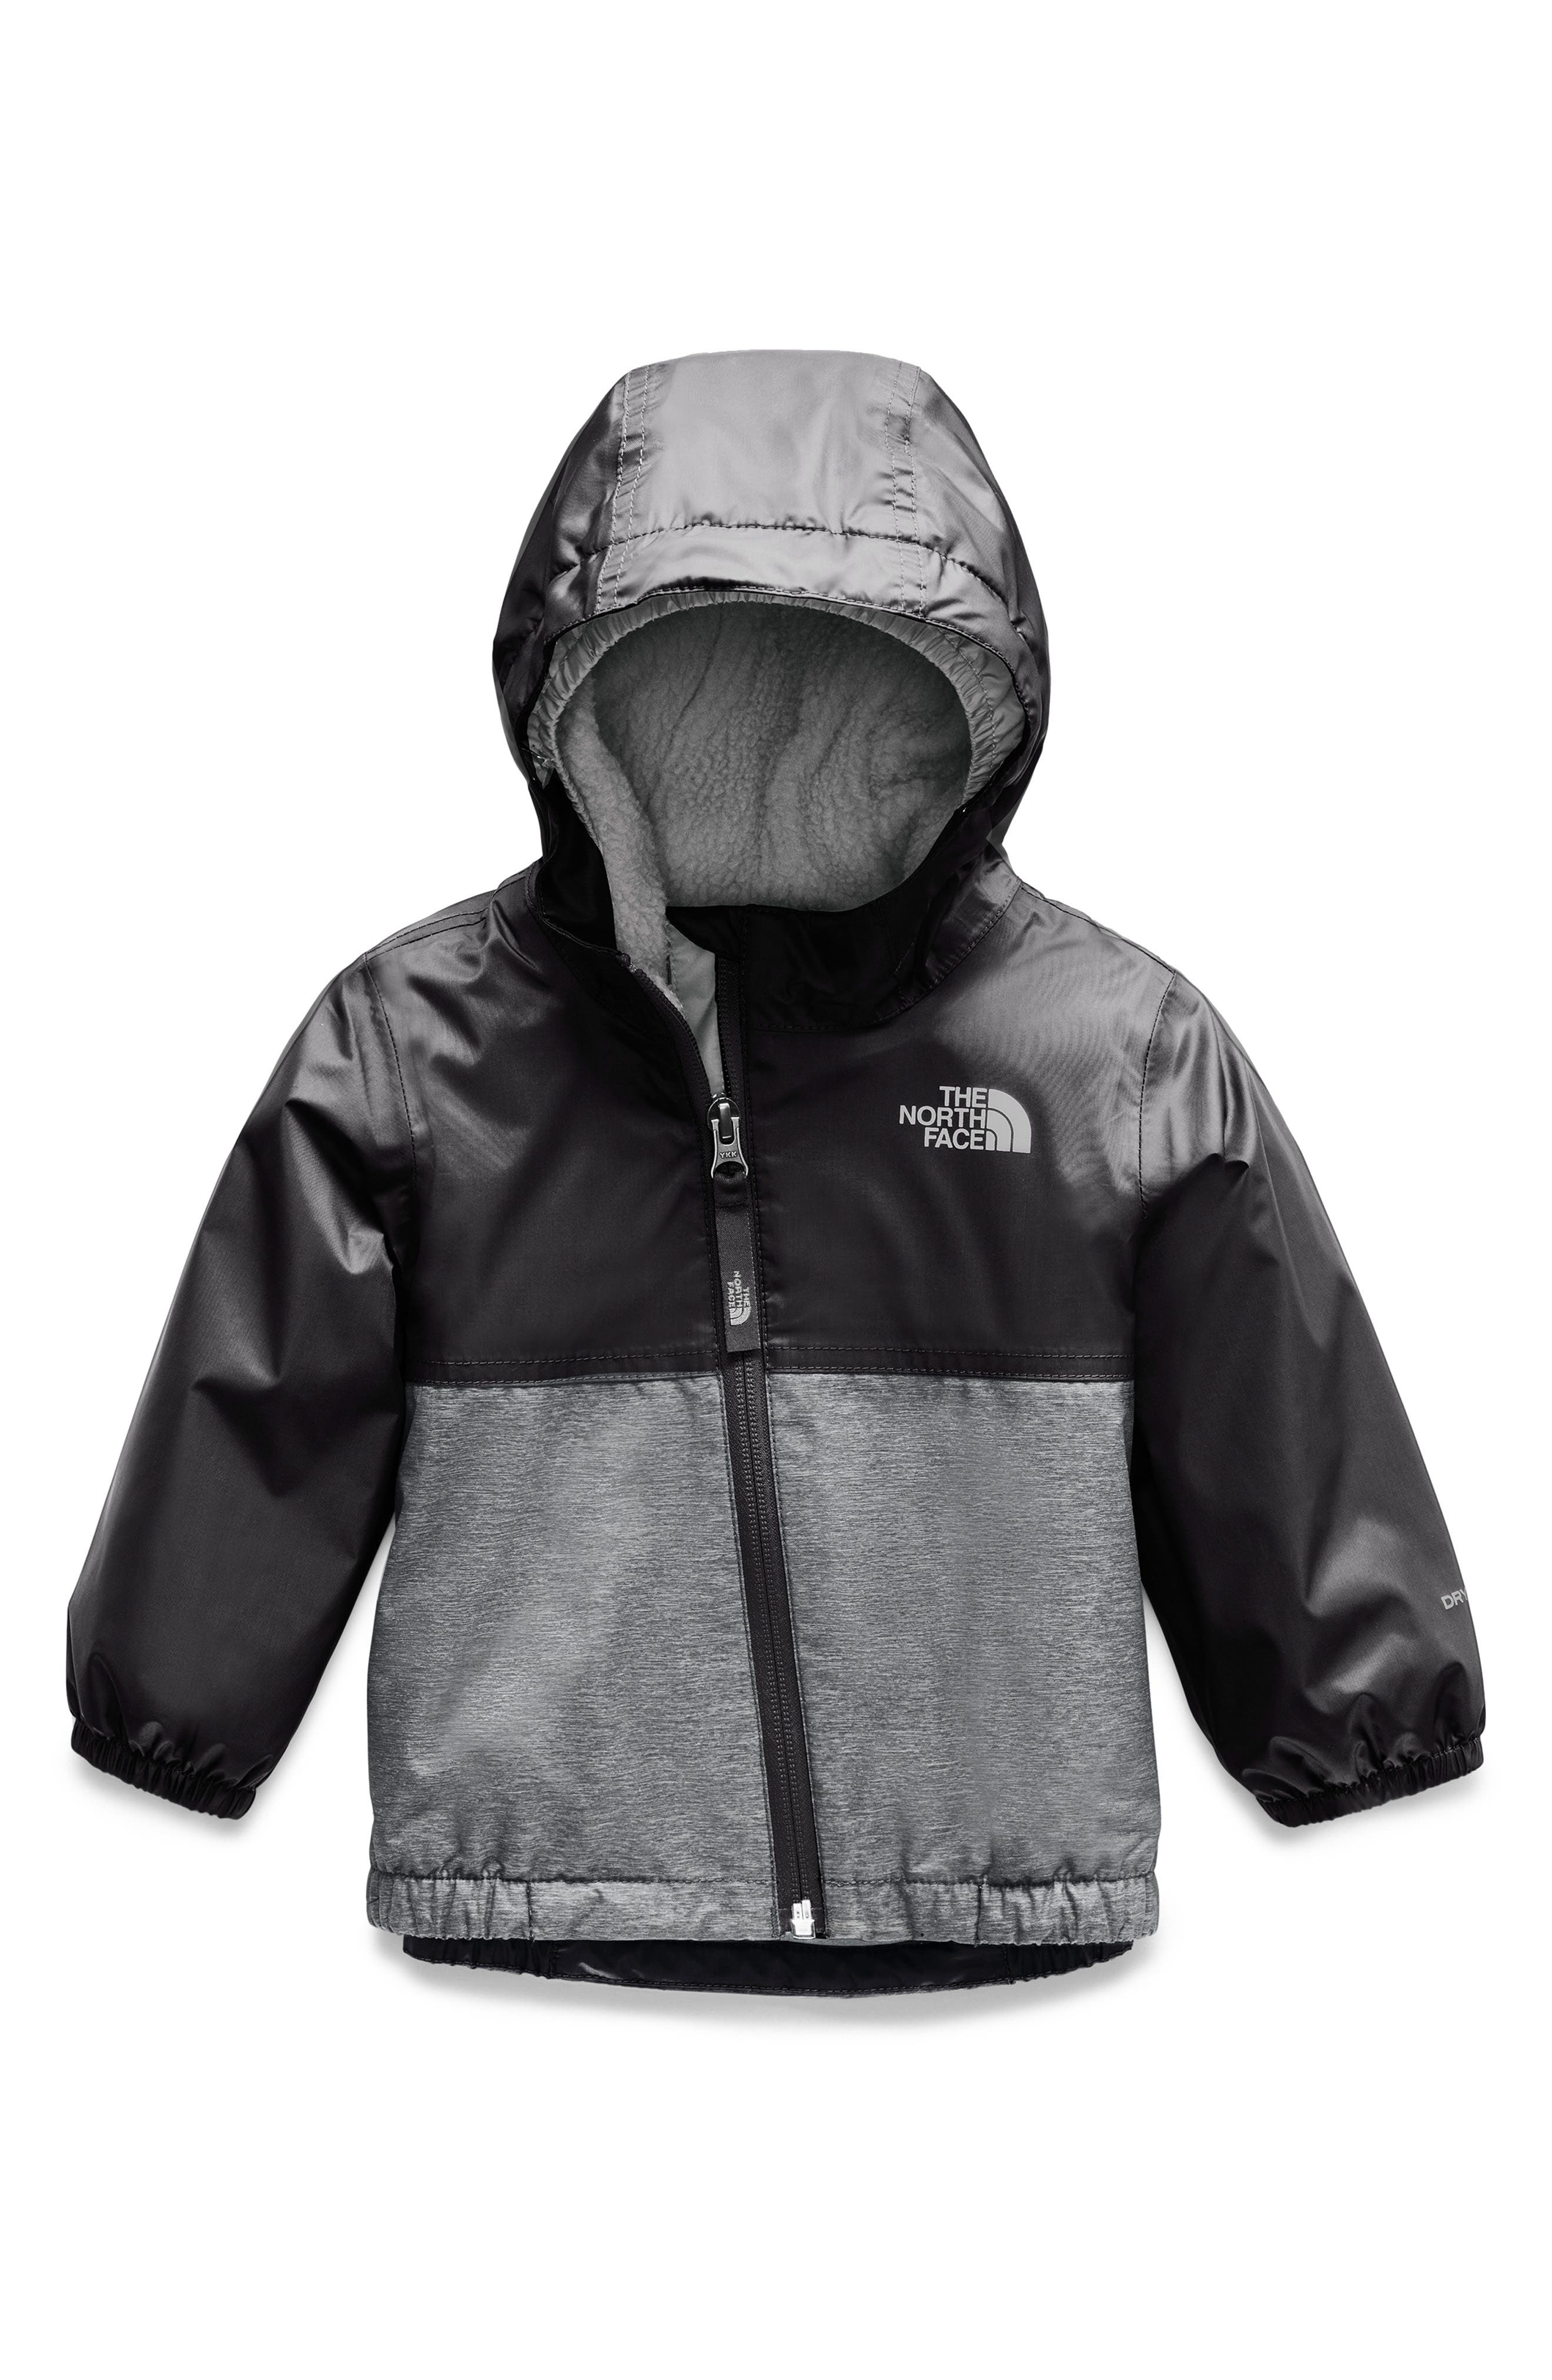 THE NORTH FACE, Warm Storm Waterproof Jacket, Main thumbnail 1, color, TNF BLACK